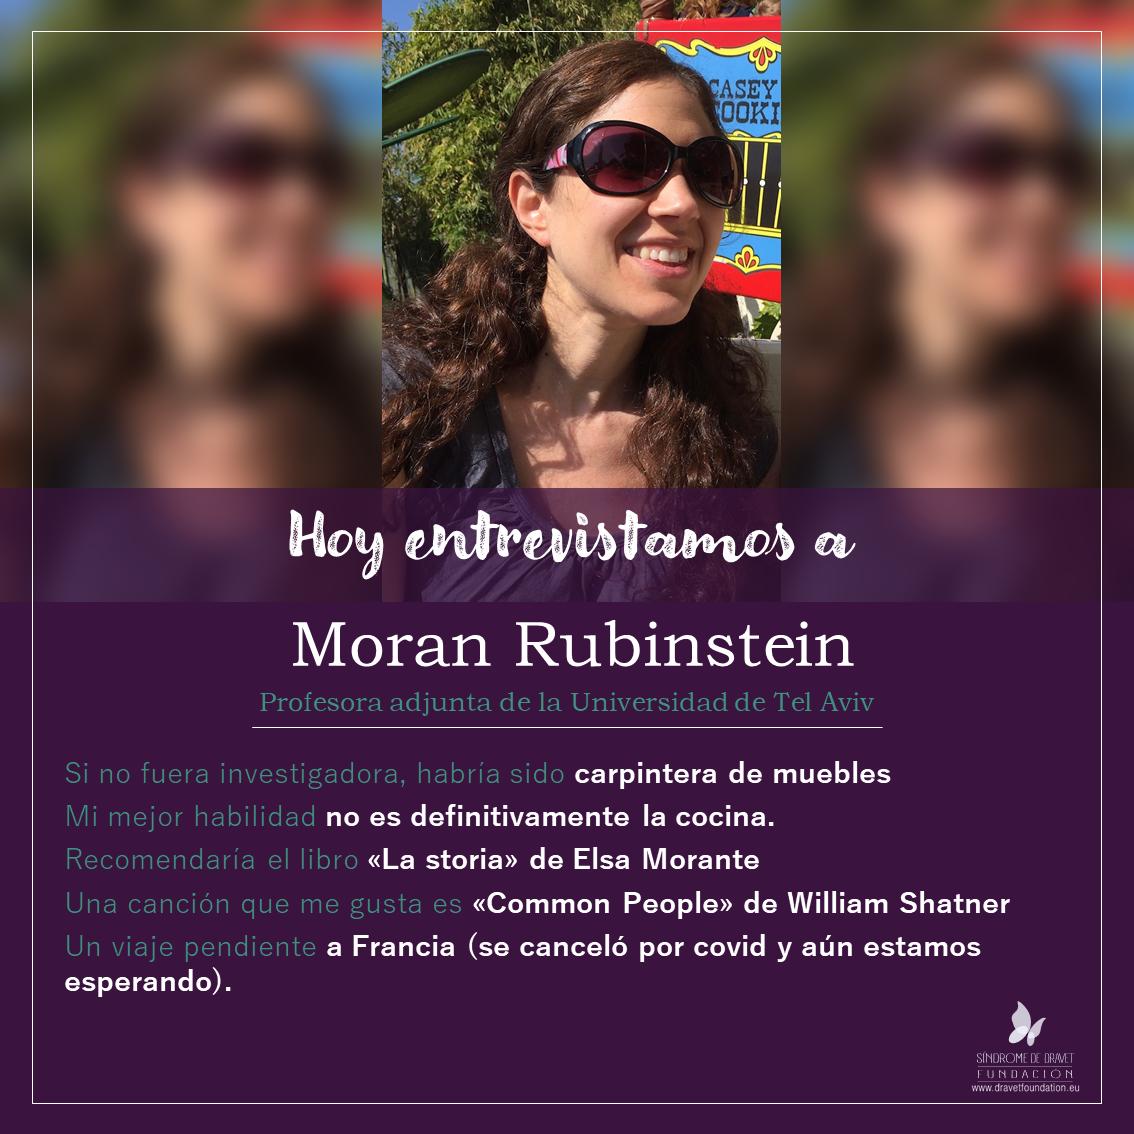 Entrevistamos a Moran Rubinstein